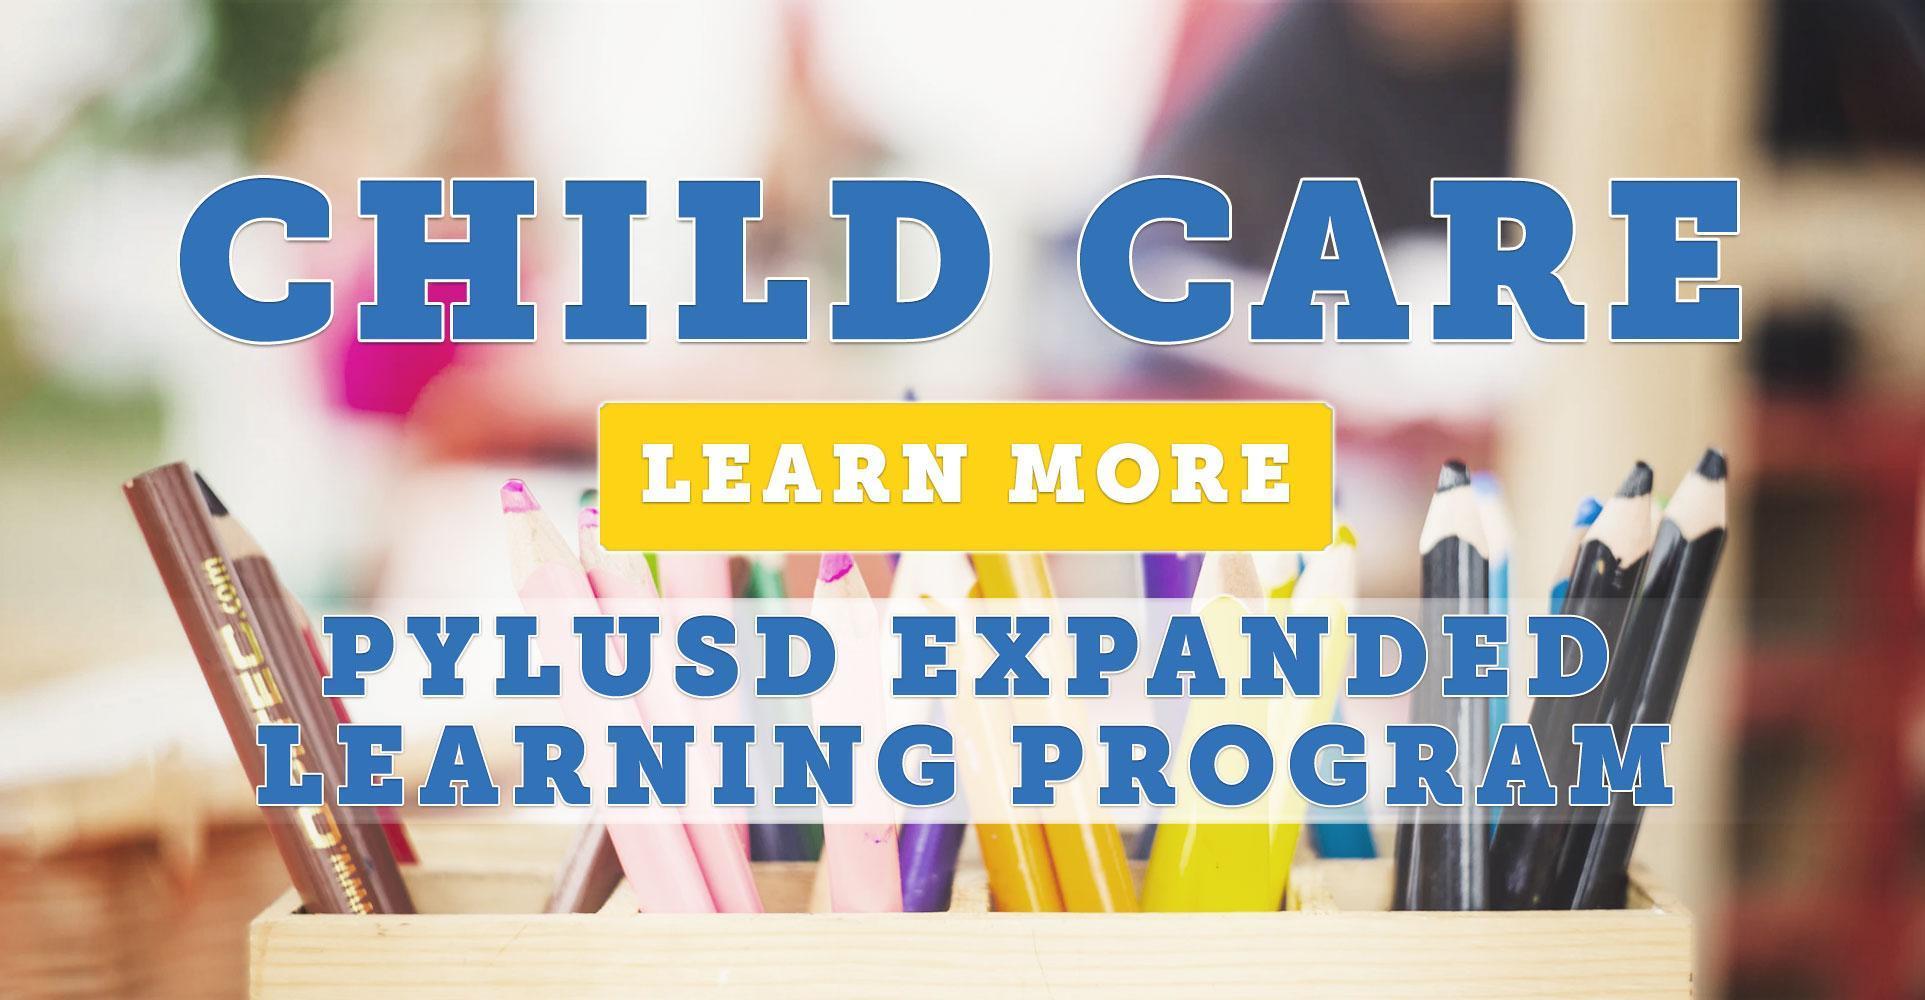 Child Care Announcement